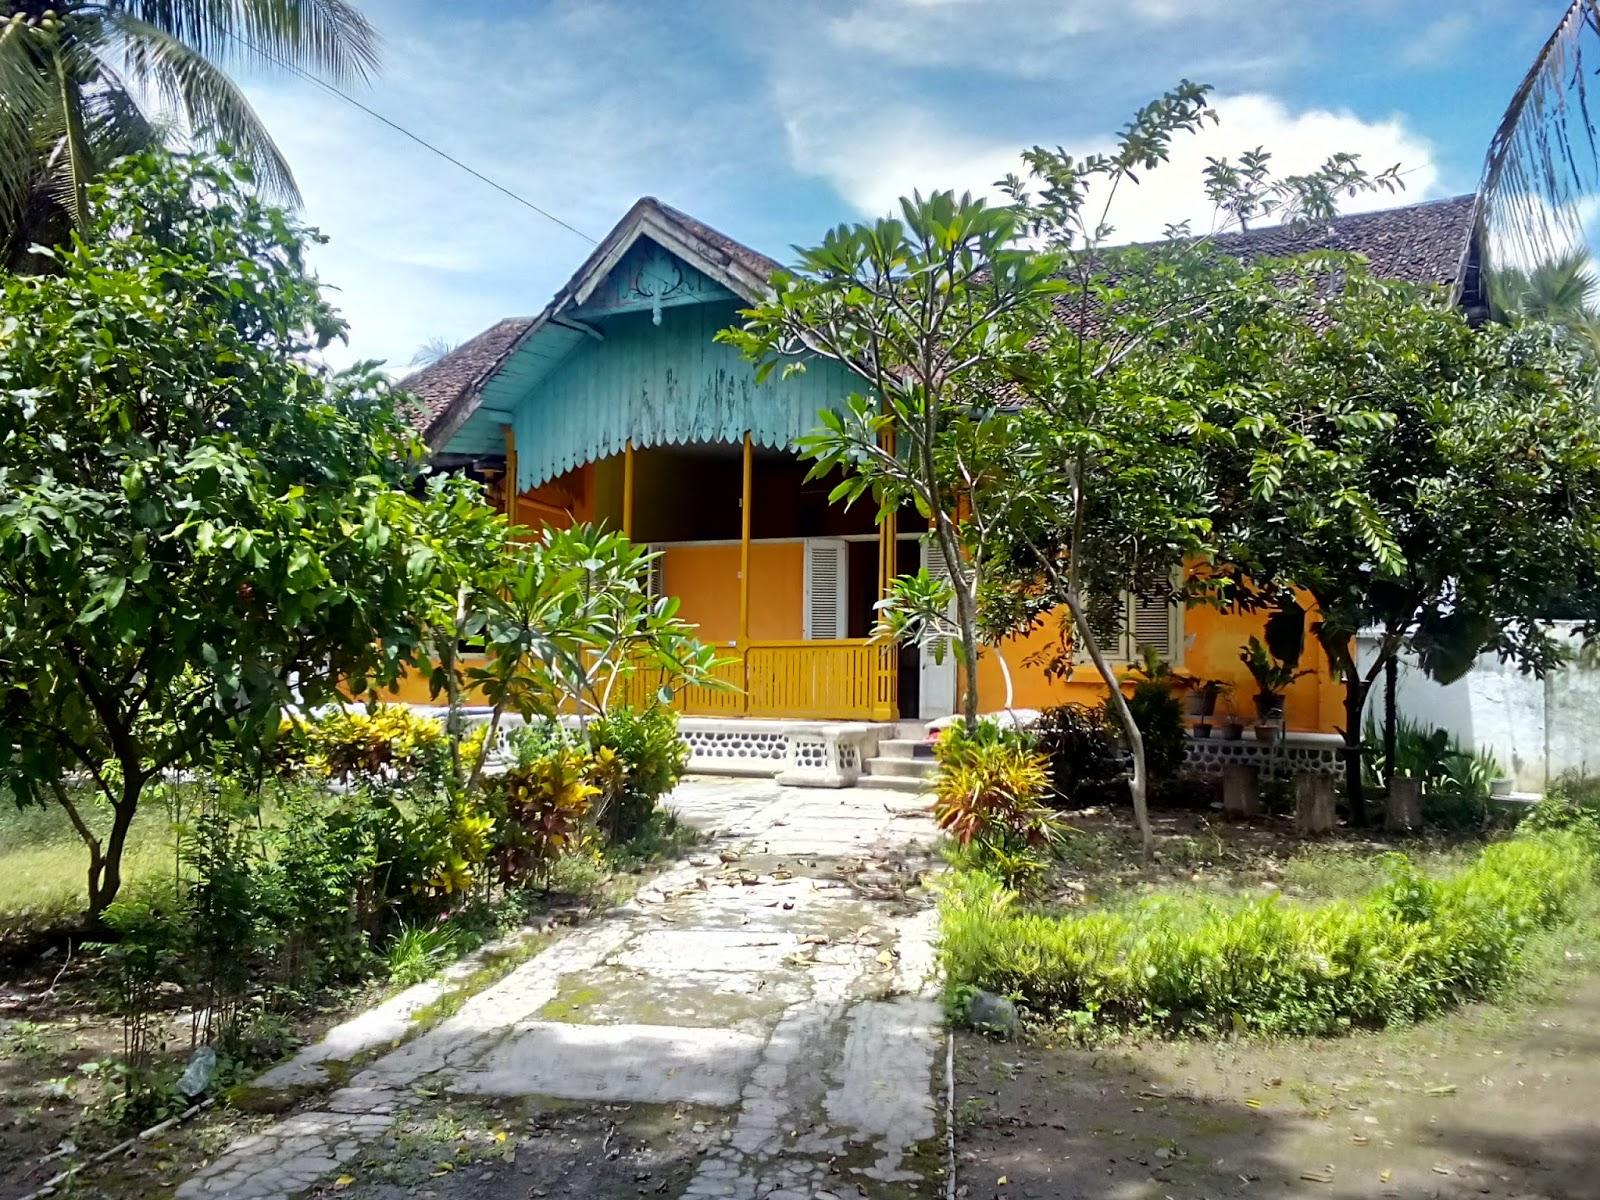 Rumah - rumah bergaya kolonial dari berbagai penjuru Indonesia (Pict ++) & Rumah - rumah bergaya kolonial dari berbagai penjuru Indonesia (Pict ...